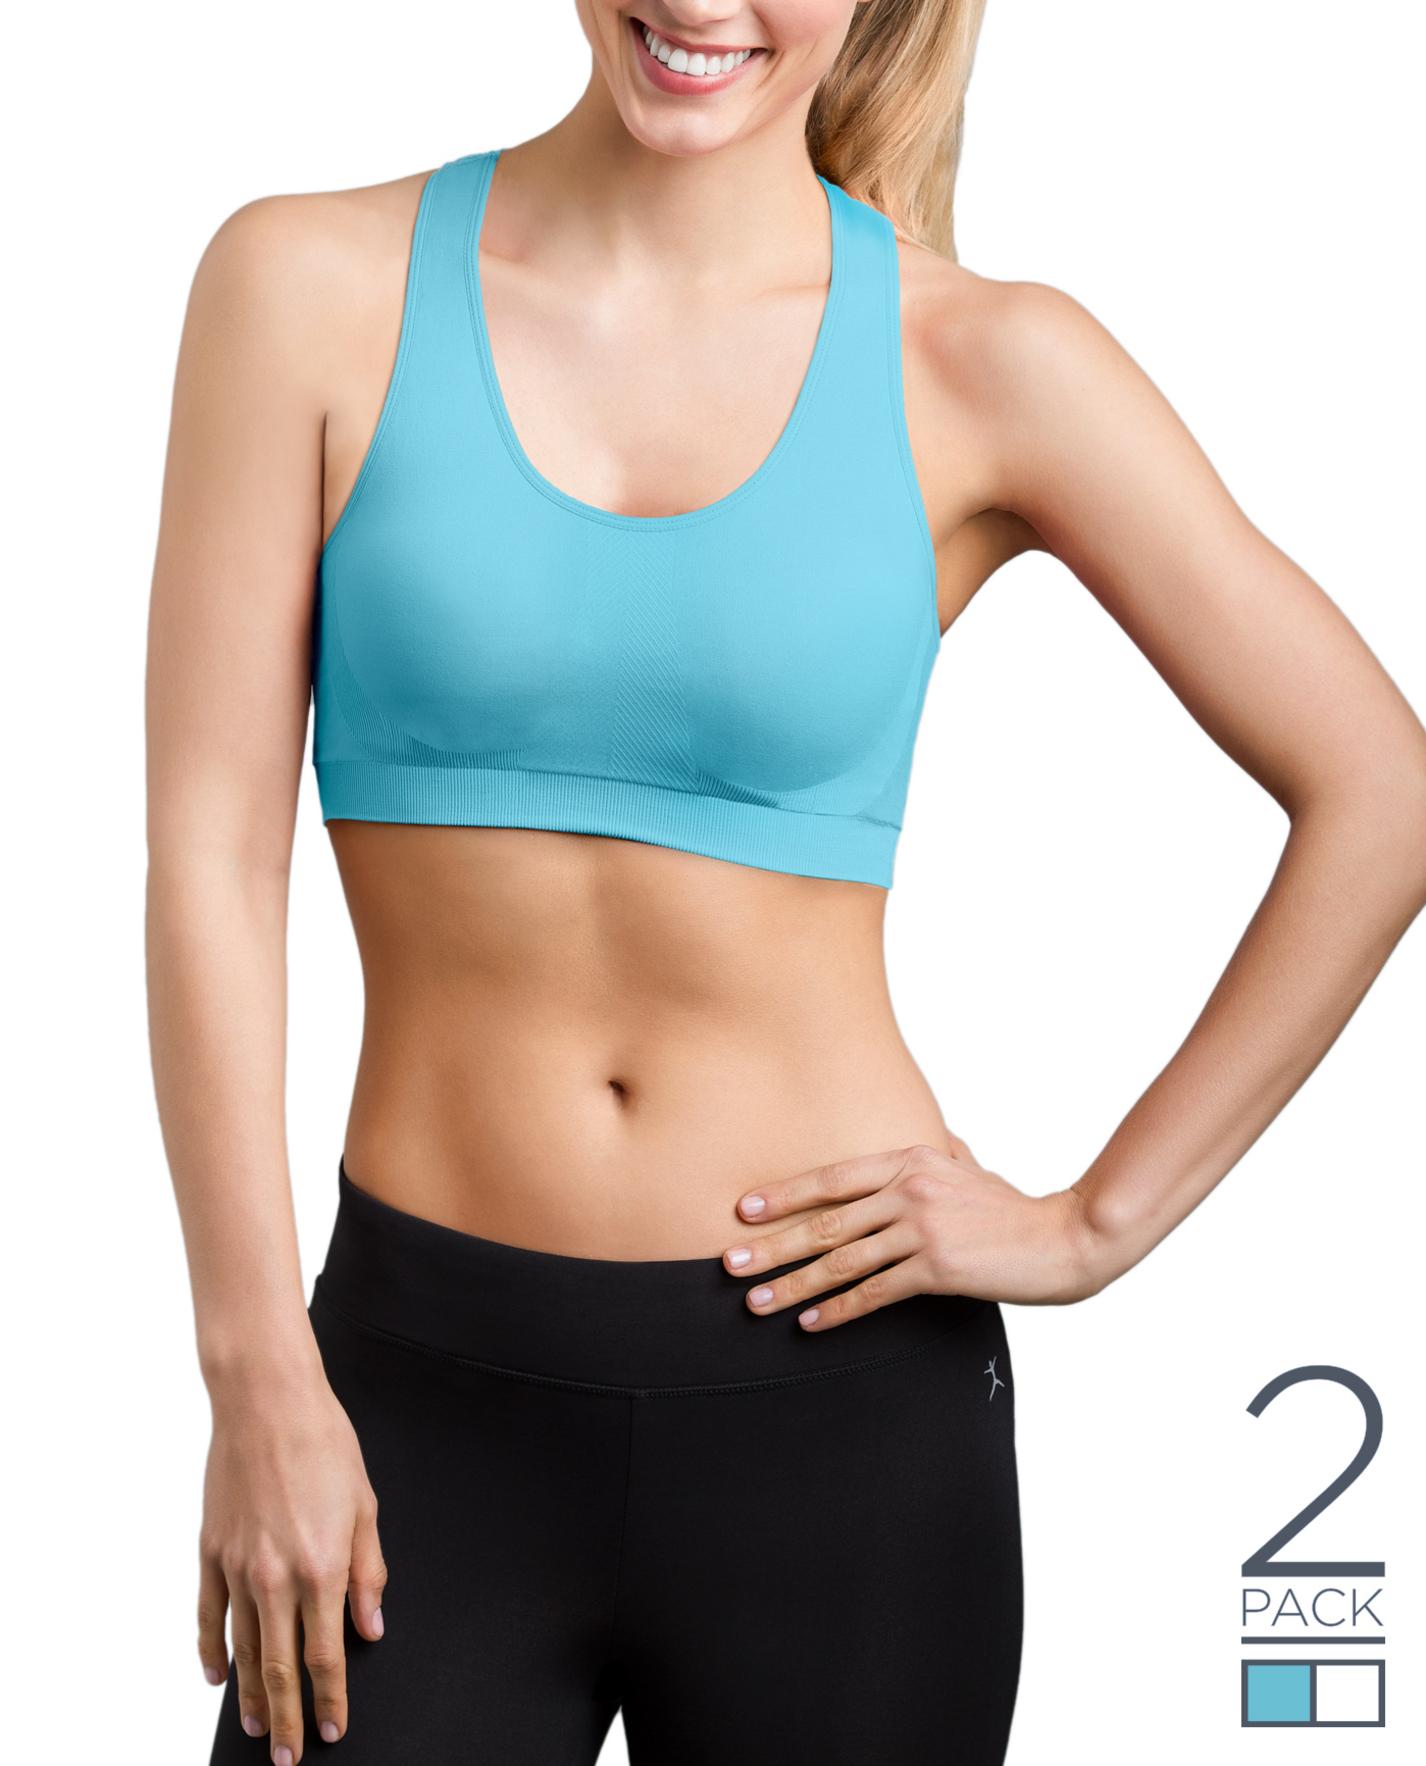 a356959773b66 Danskin New Customers: 2-Pack Women's Seamless Sports Bra ...